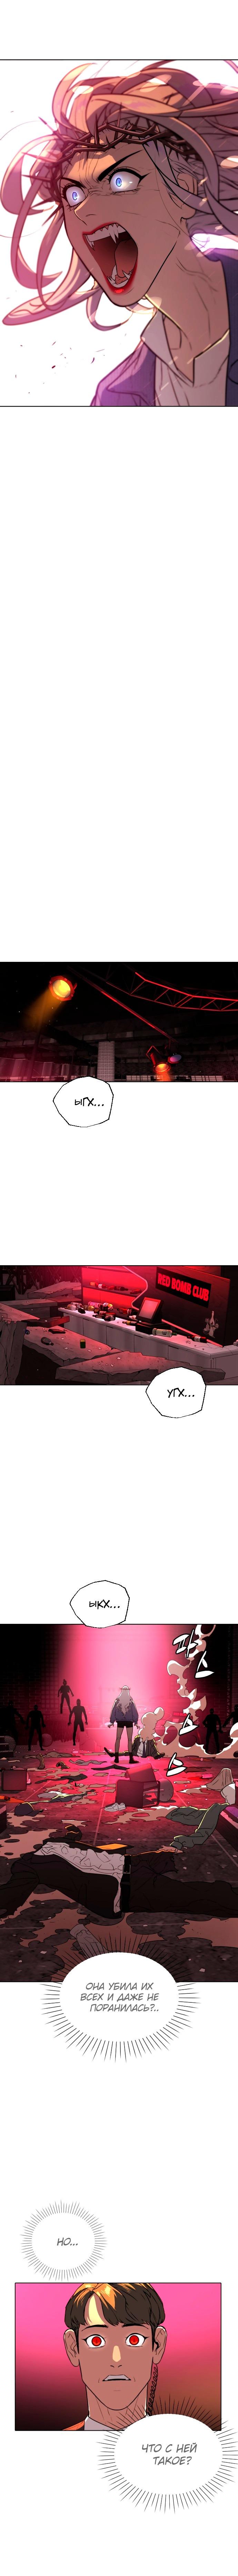 Манга Белая кровь / White Blood  - Том 1 Глава 14 Страница 8